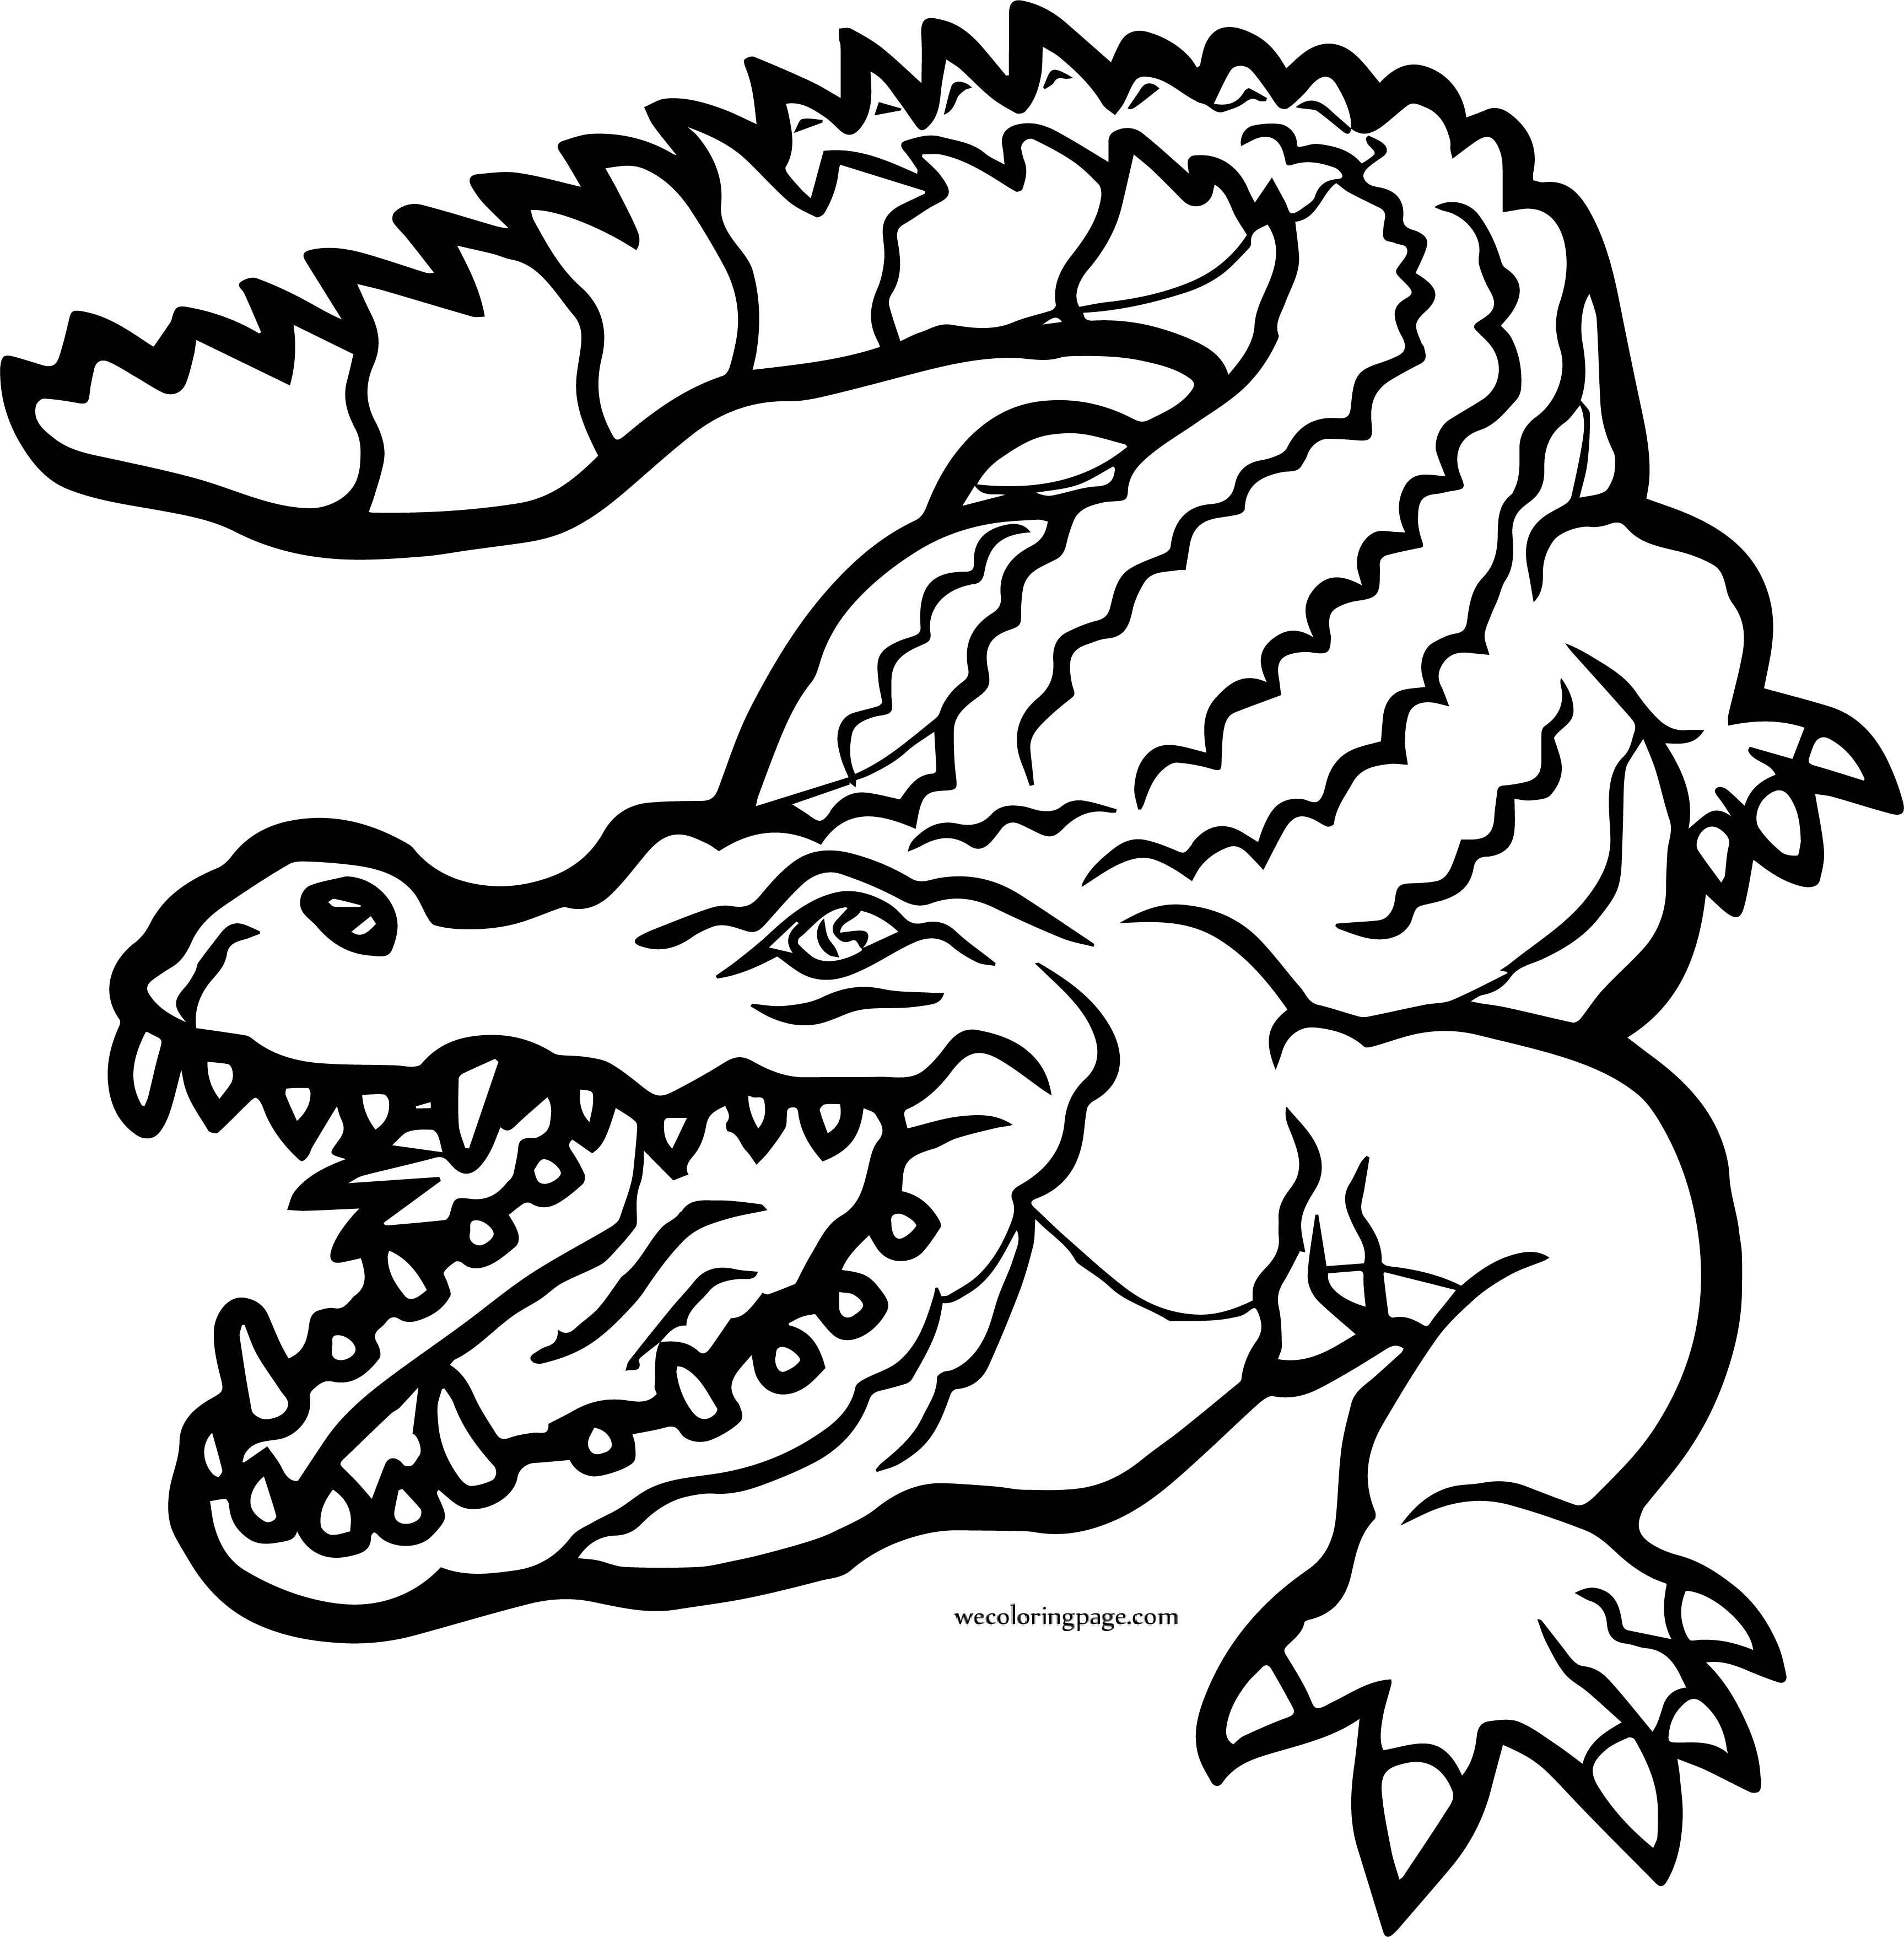 Crocodile Alligator Wild Coloring Page